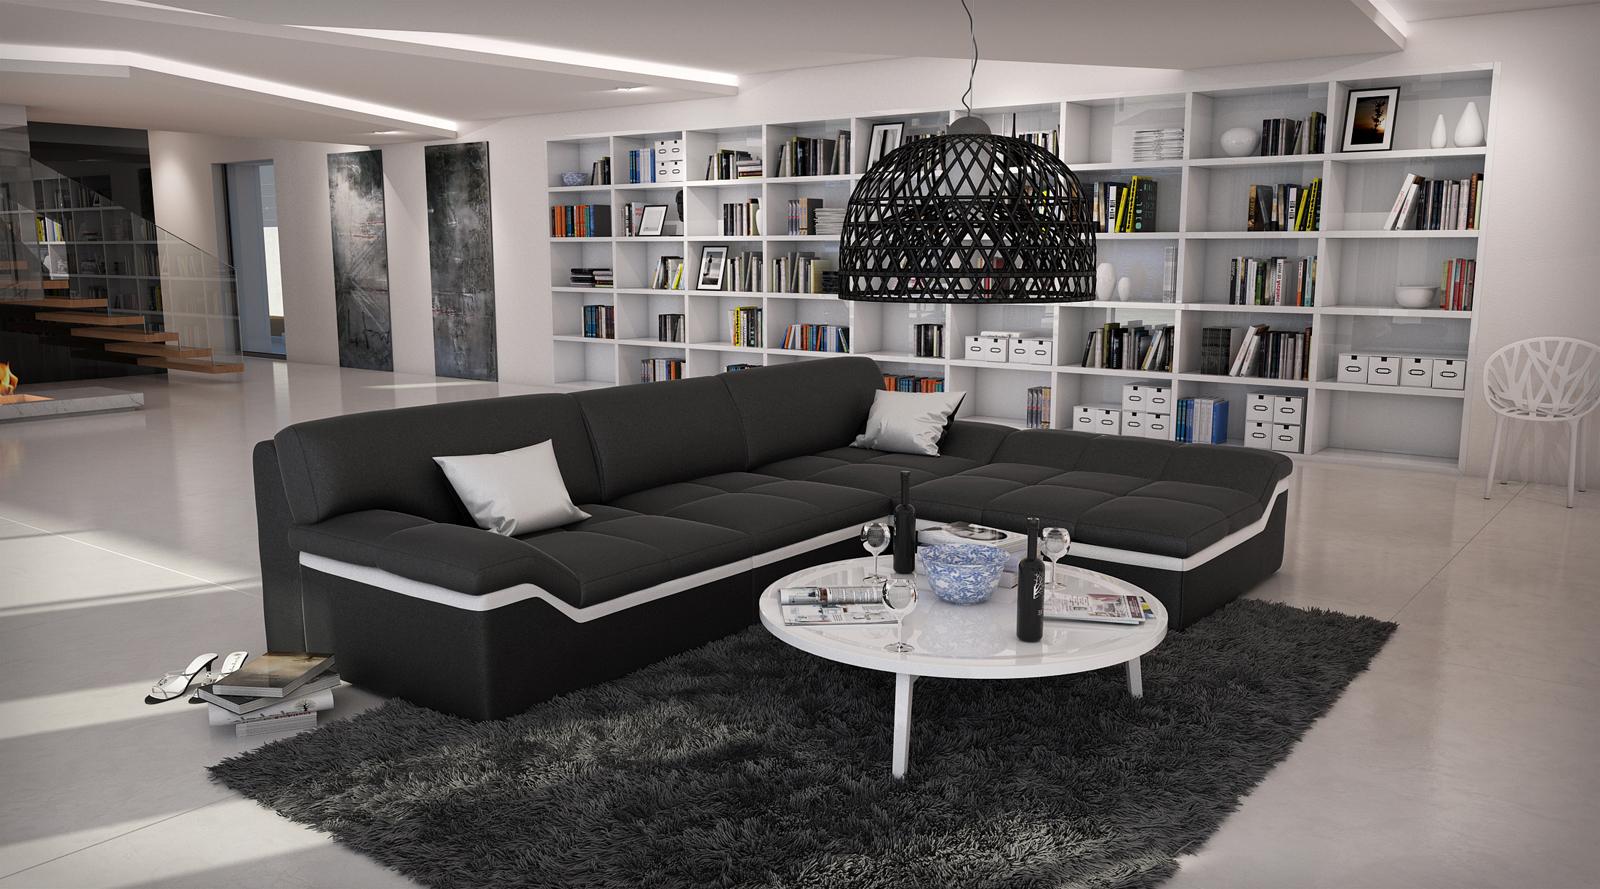 SAM® Ecksofa schwarzStripe weiß Sofa MISTICO 270 x 220 cm -> Ecksofa Trends